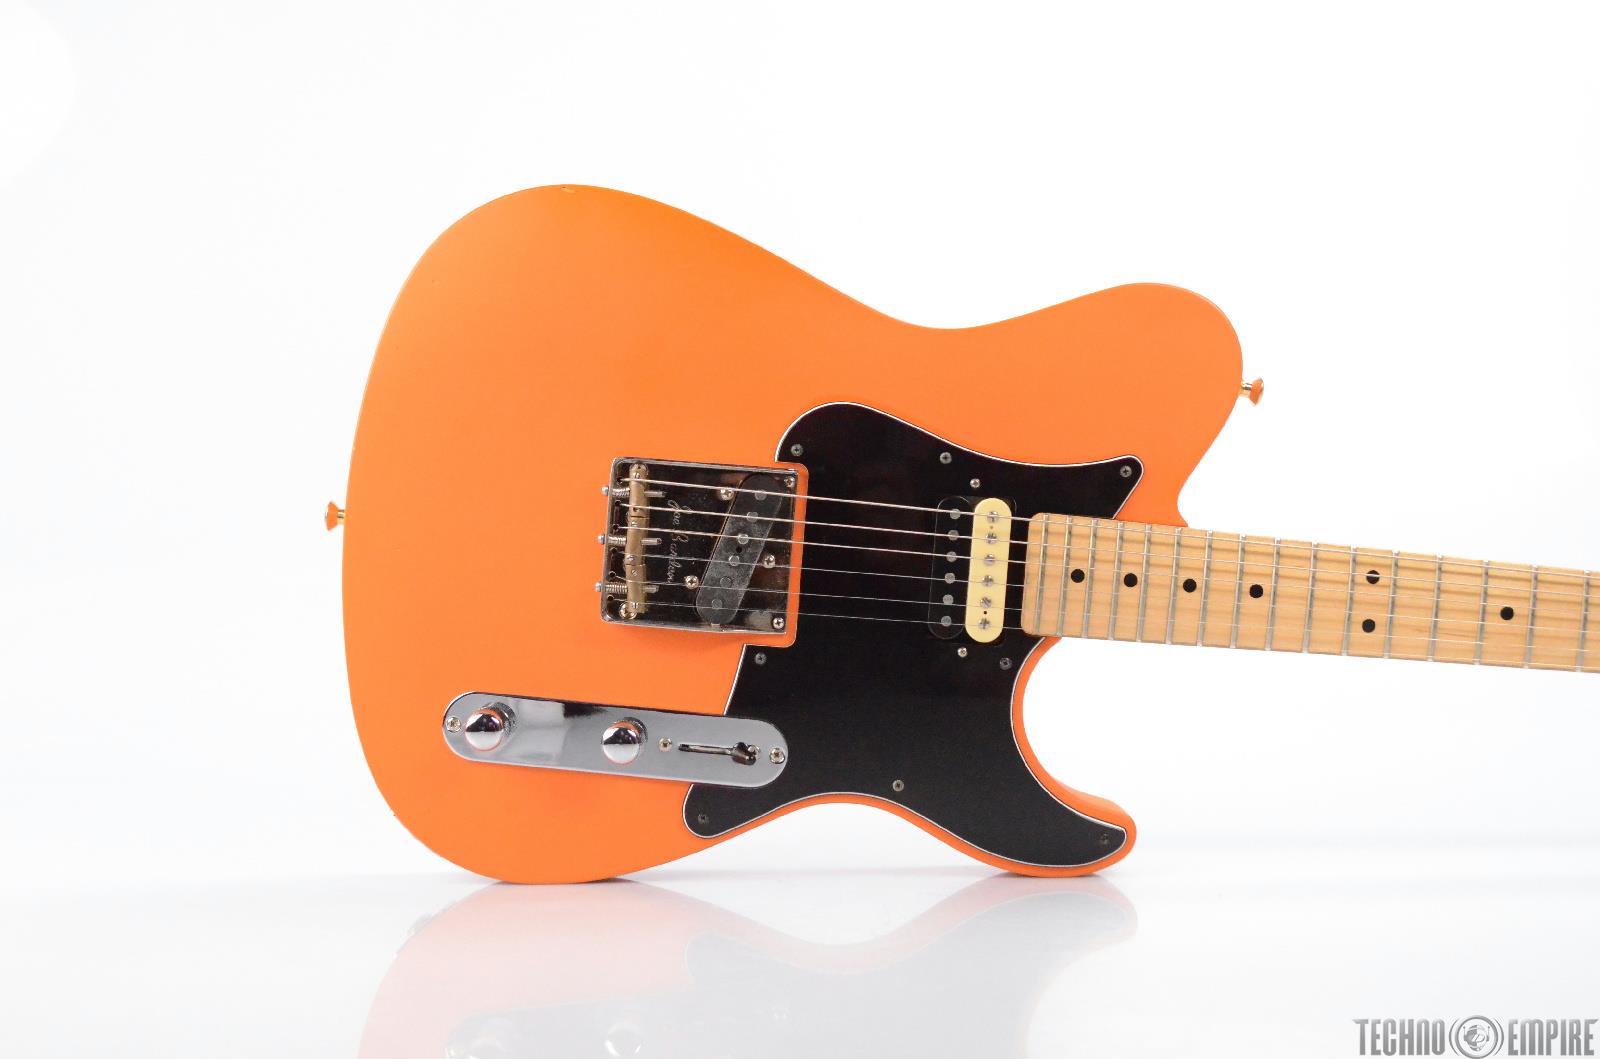 Wiring Diagram Yamaha Guitar Define Schematic Awesome Humbucker Pickup Pacifica 3 Sound Installation Fender